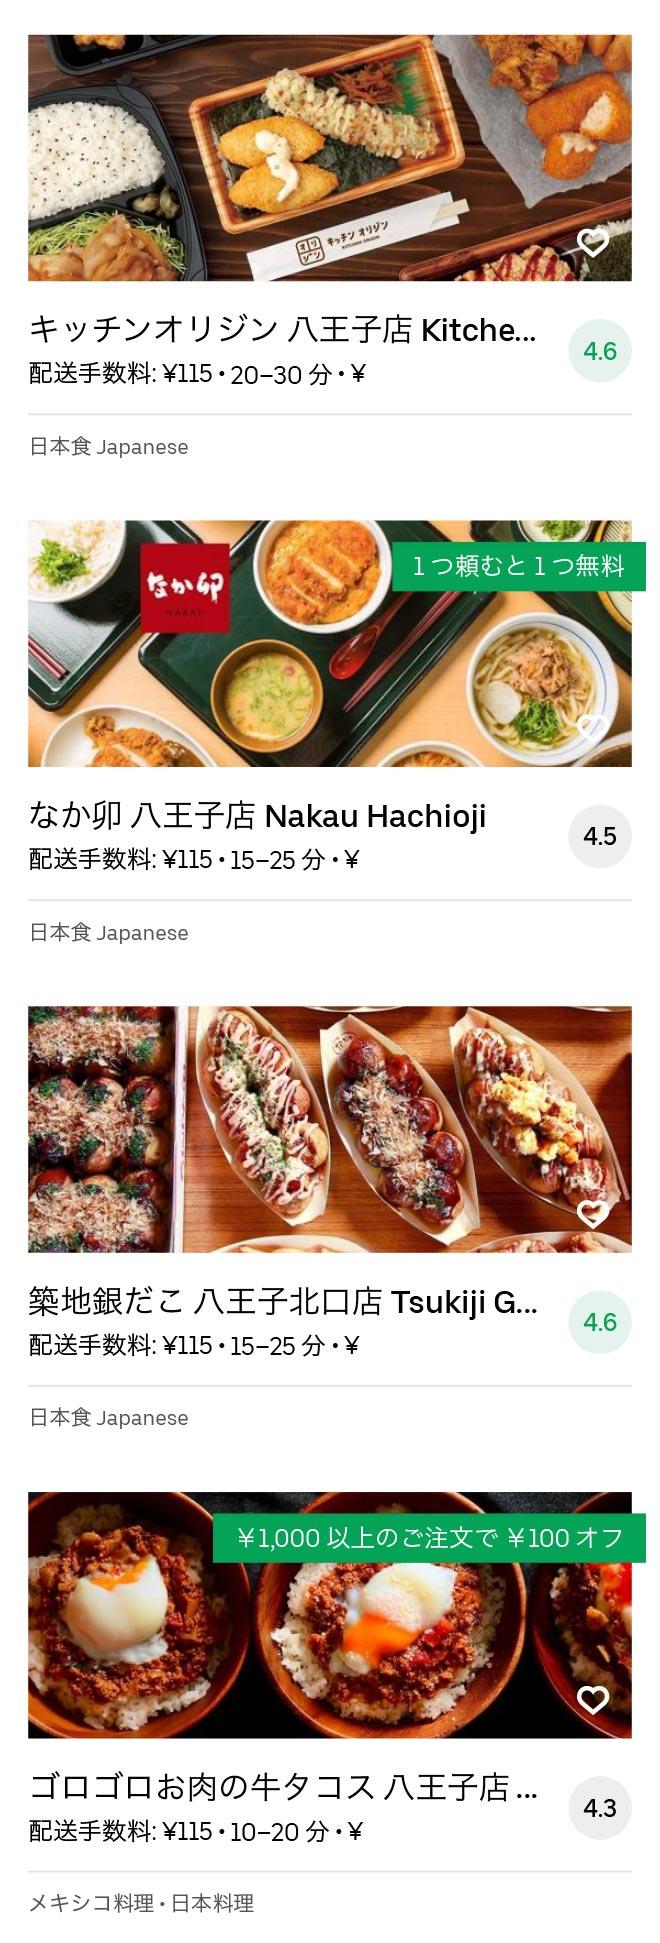 Hatioji menu 2010 04